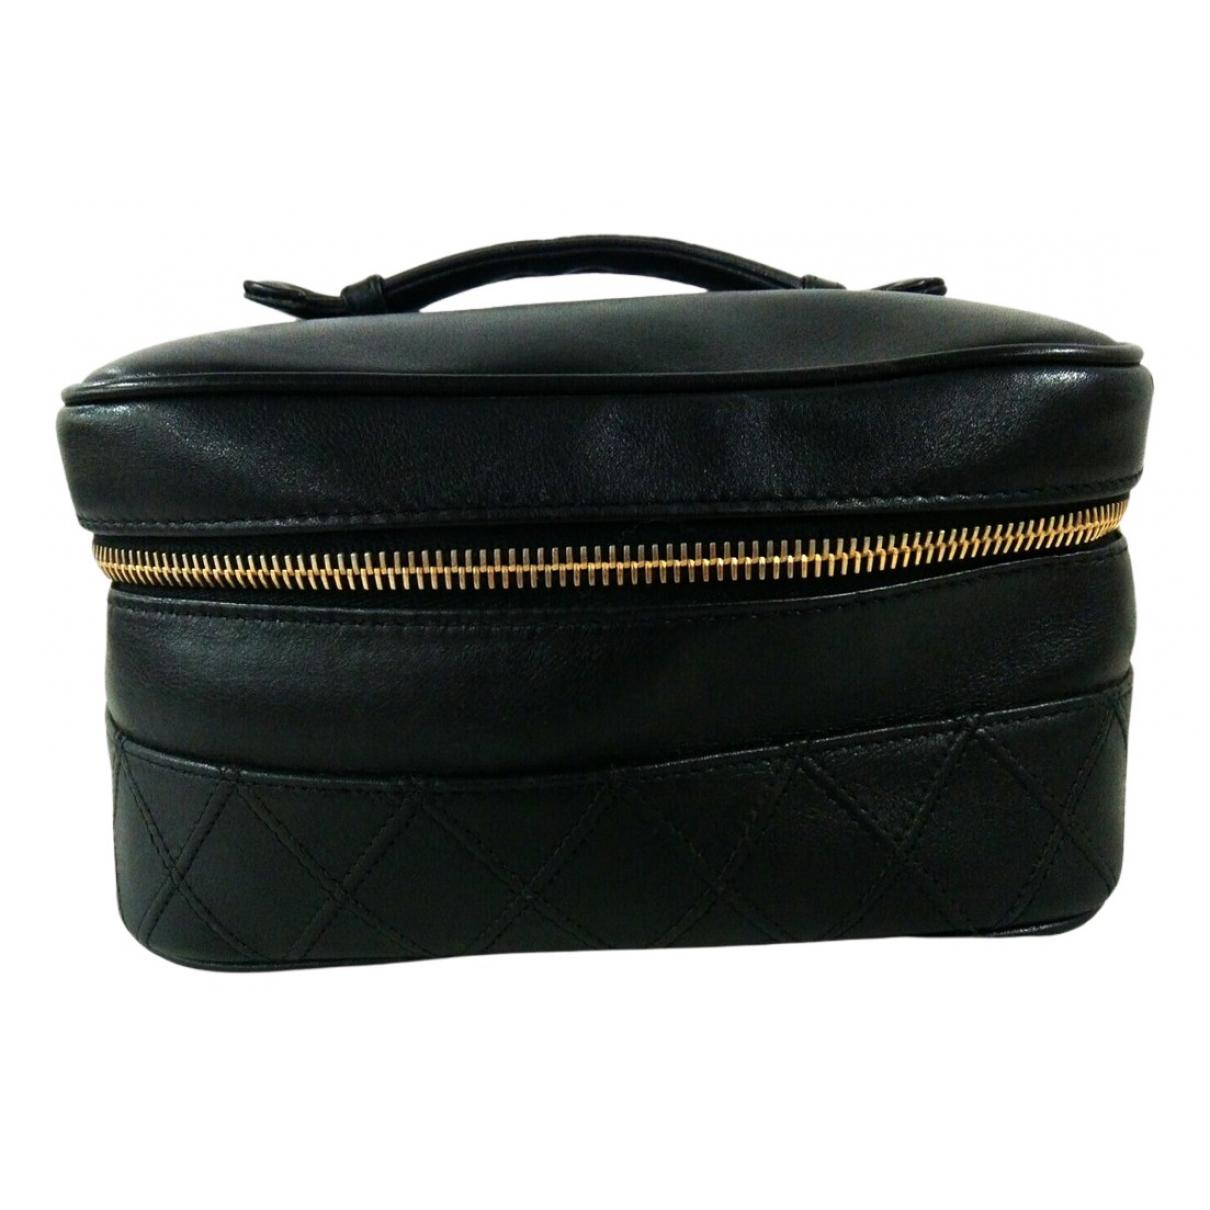 Chanel \N Black Leather Travel bag for Women \N